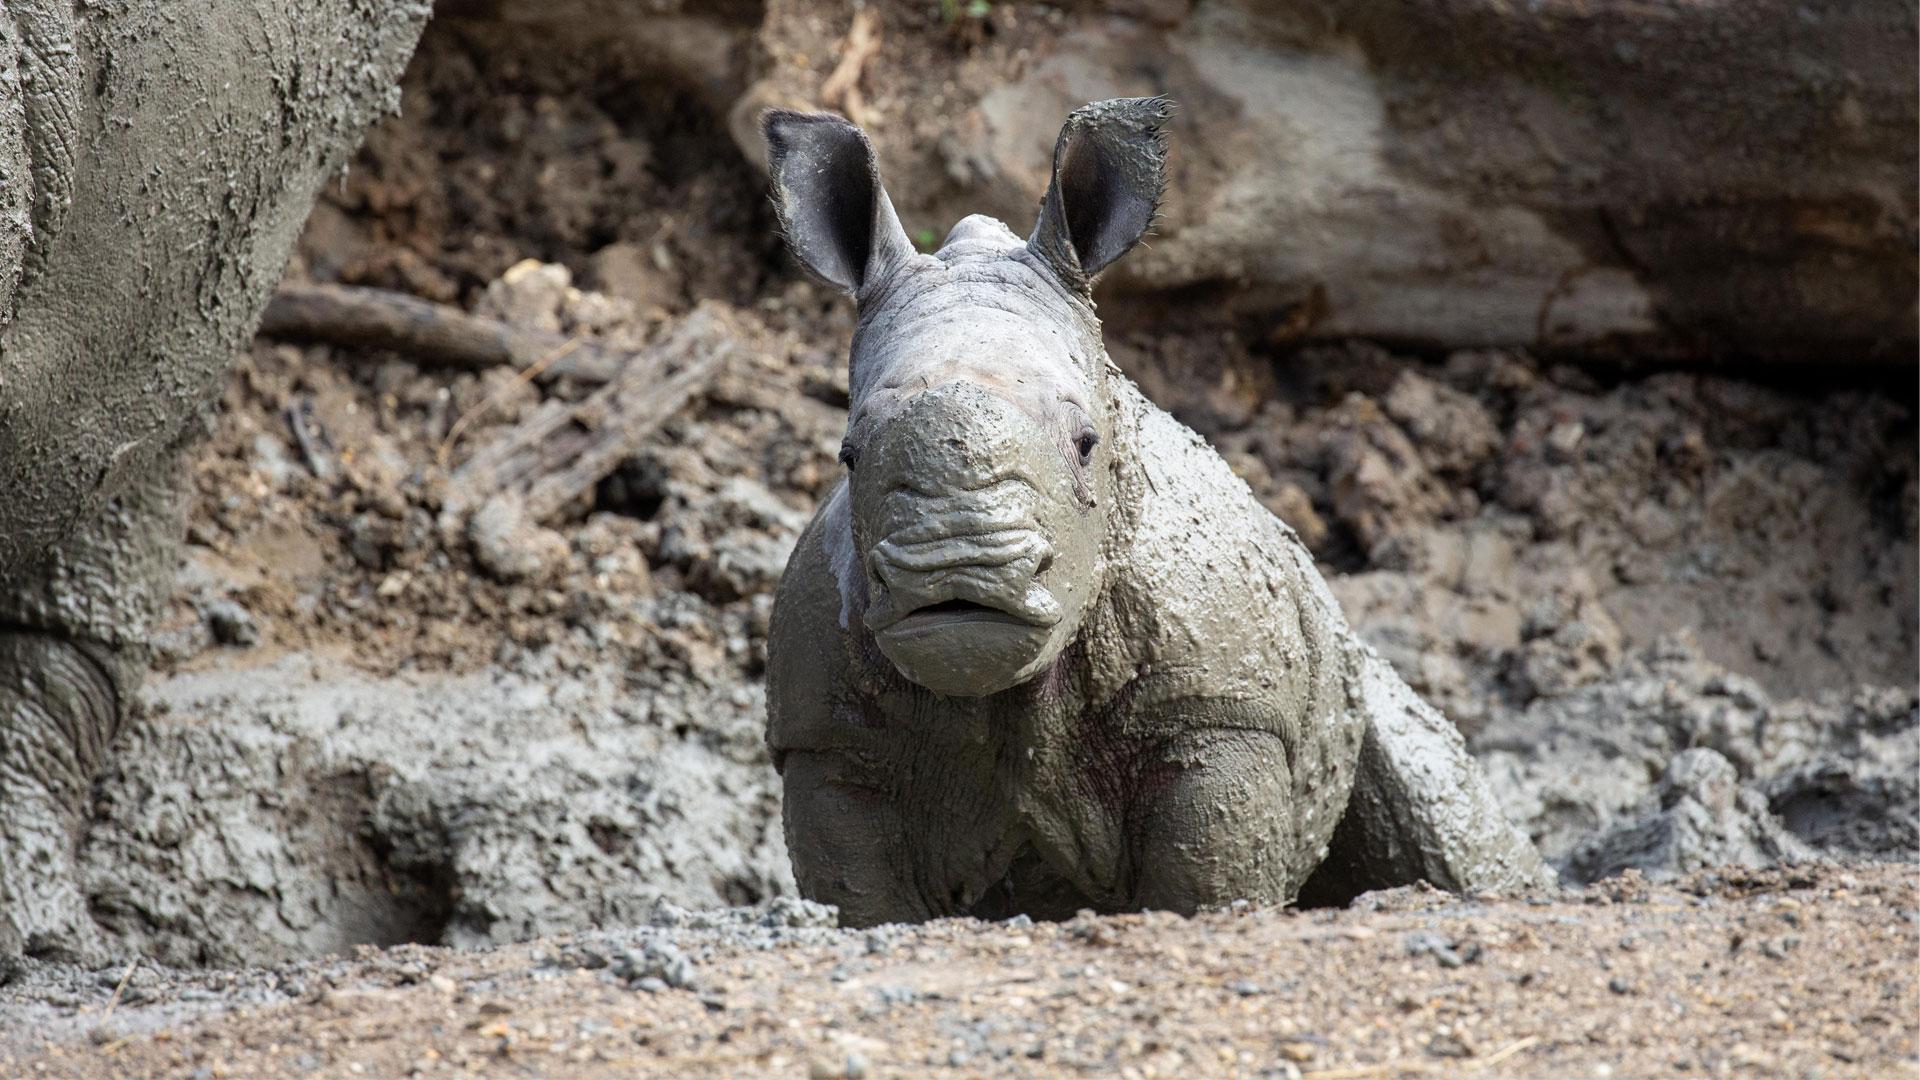 https://rfacdn.nz/zoo/assets/media/rhino-calf-in-habitat-gallery-3.jpg